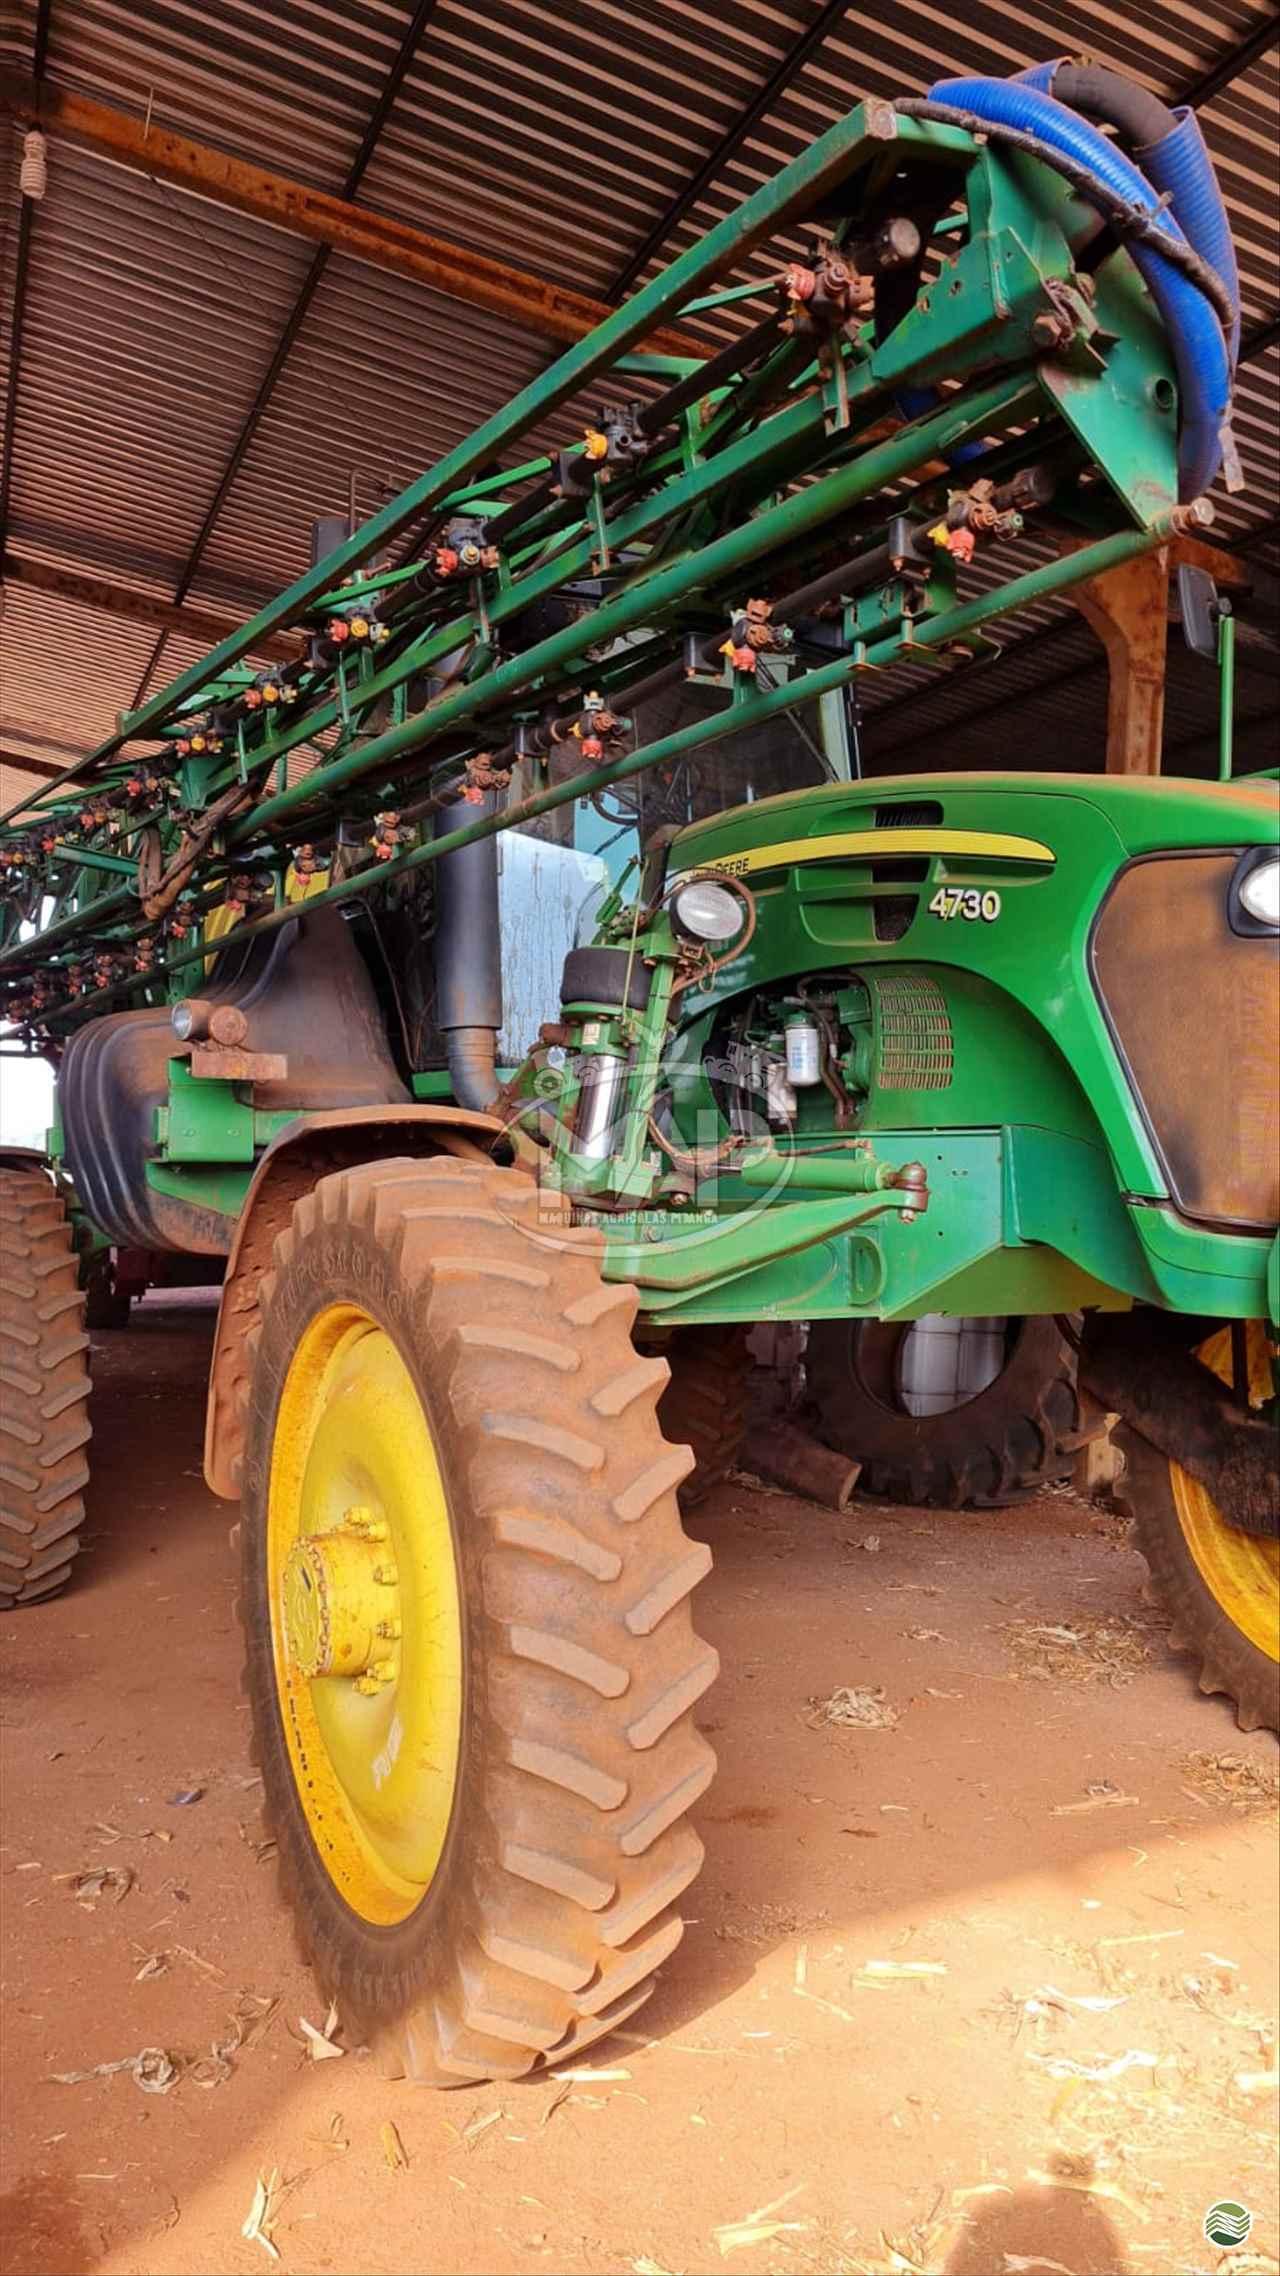 PULVERIZADOR JOHN DEERE JOHN DEERE 4730 Tração 4x4 Máquinas Agrícolas Pitanga PITANGA PARANÁ PR